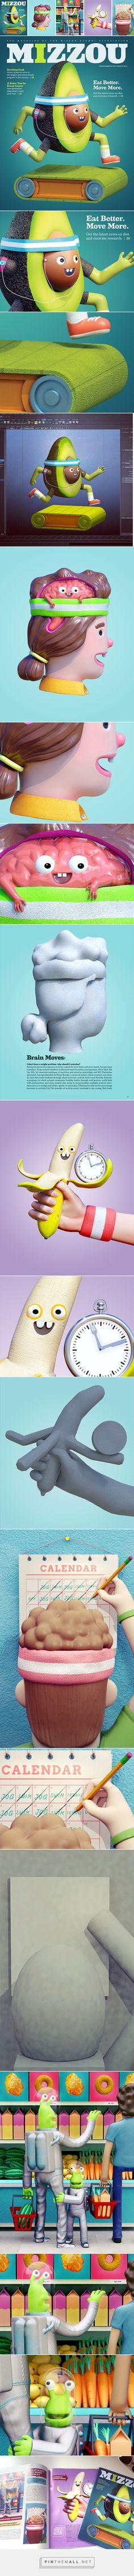 EAT BETTER & MOVE MORE: Mizzou on Digital Art Served - created via http://pinthemall.net